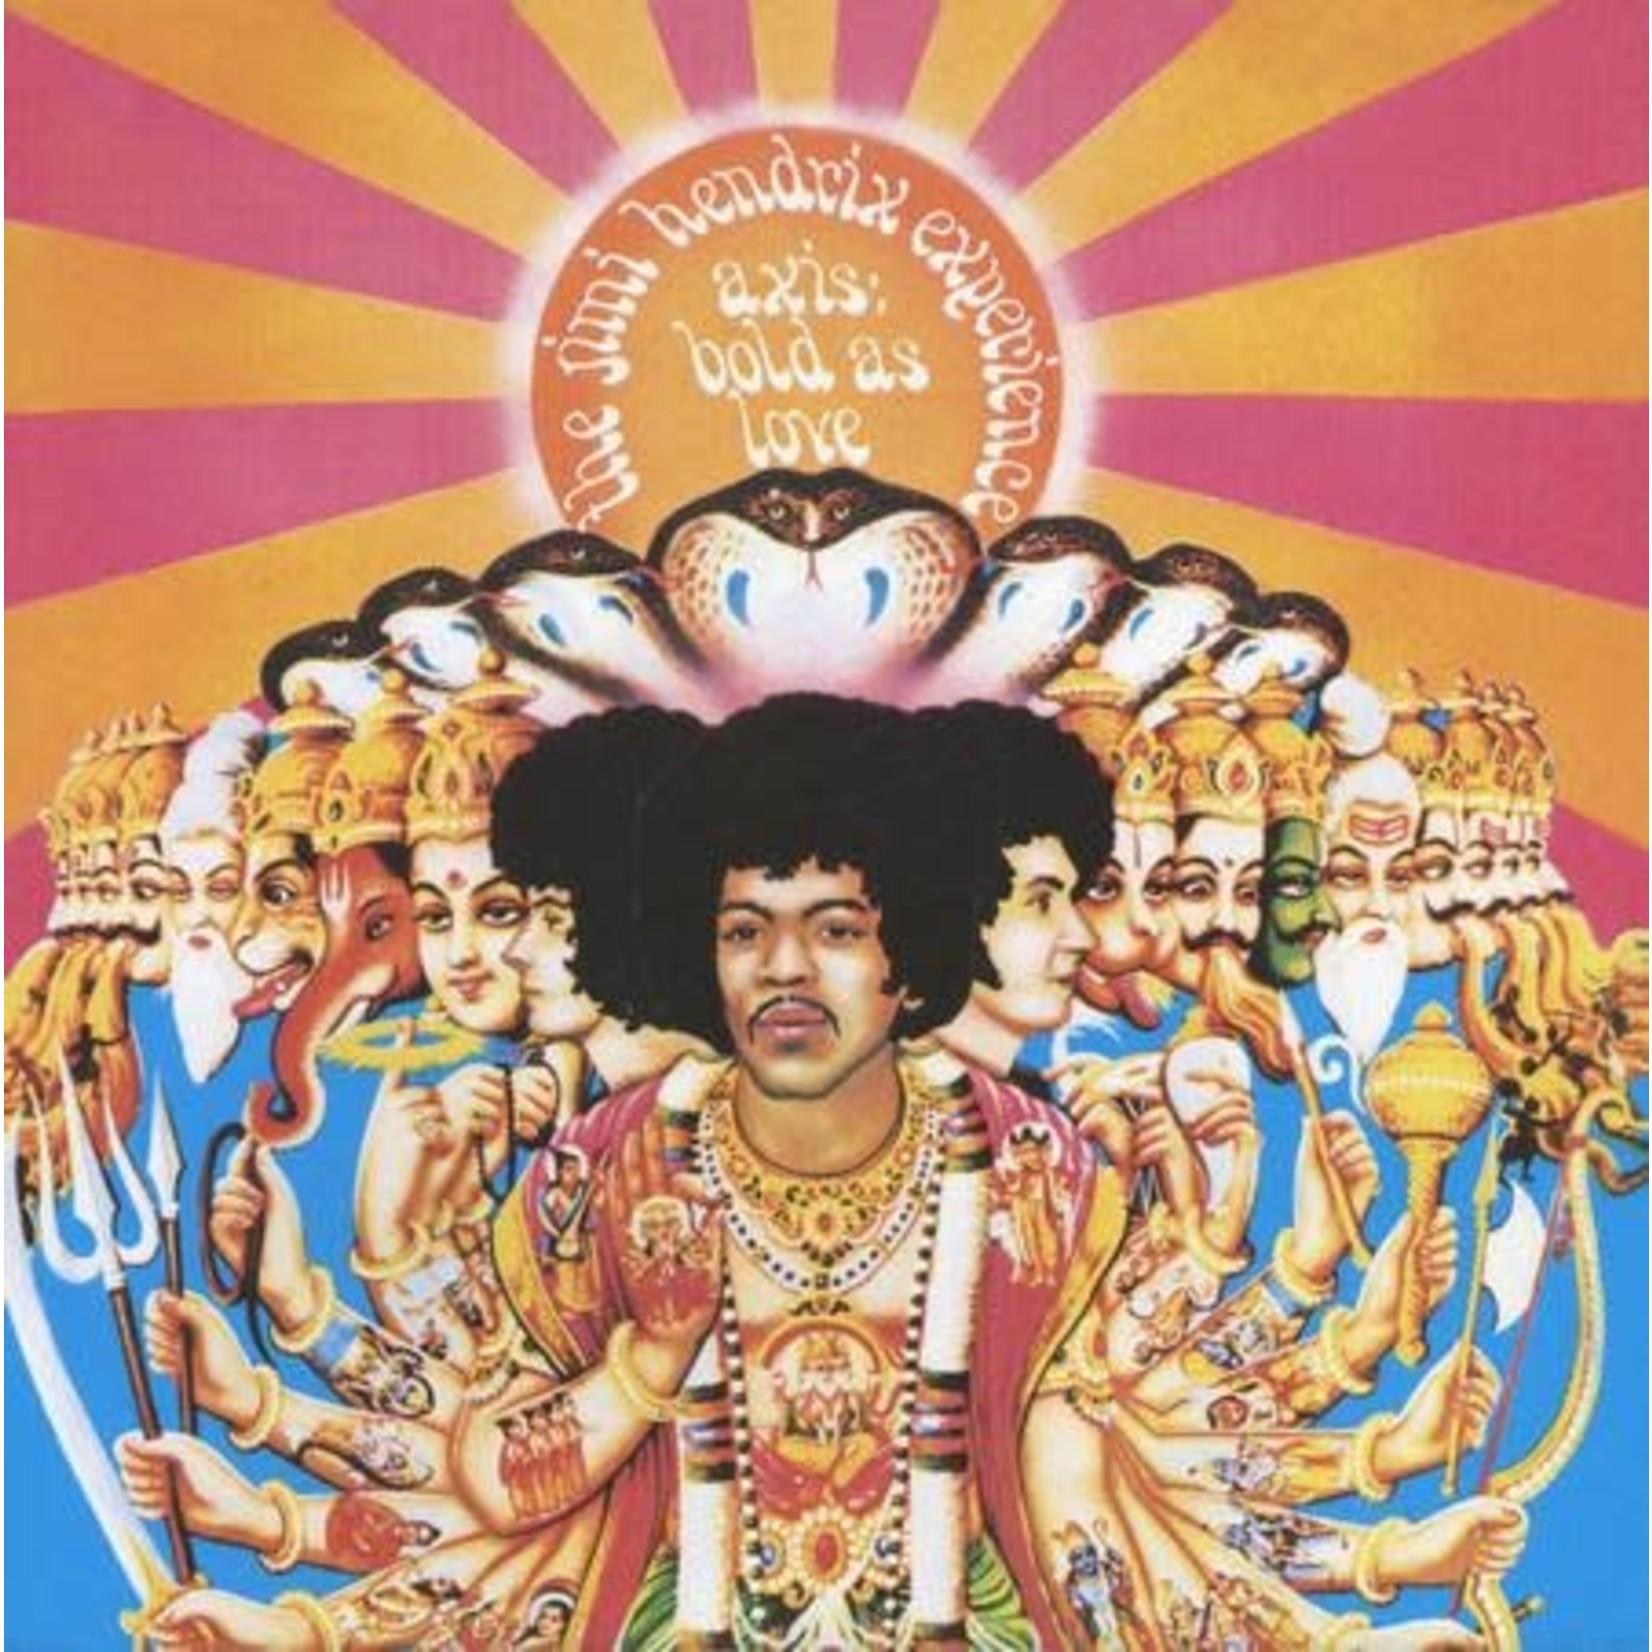 Compact Disc The Jimi Hendrix Experience - Axis: Bold As Love SACD